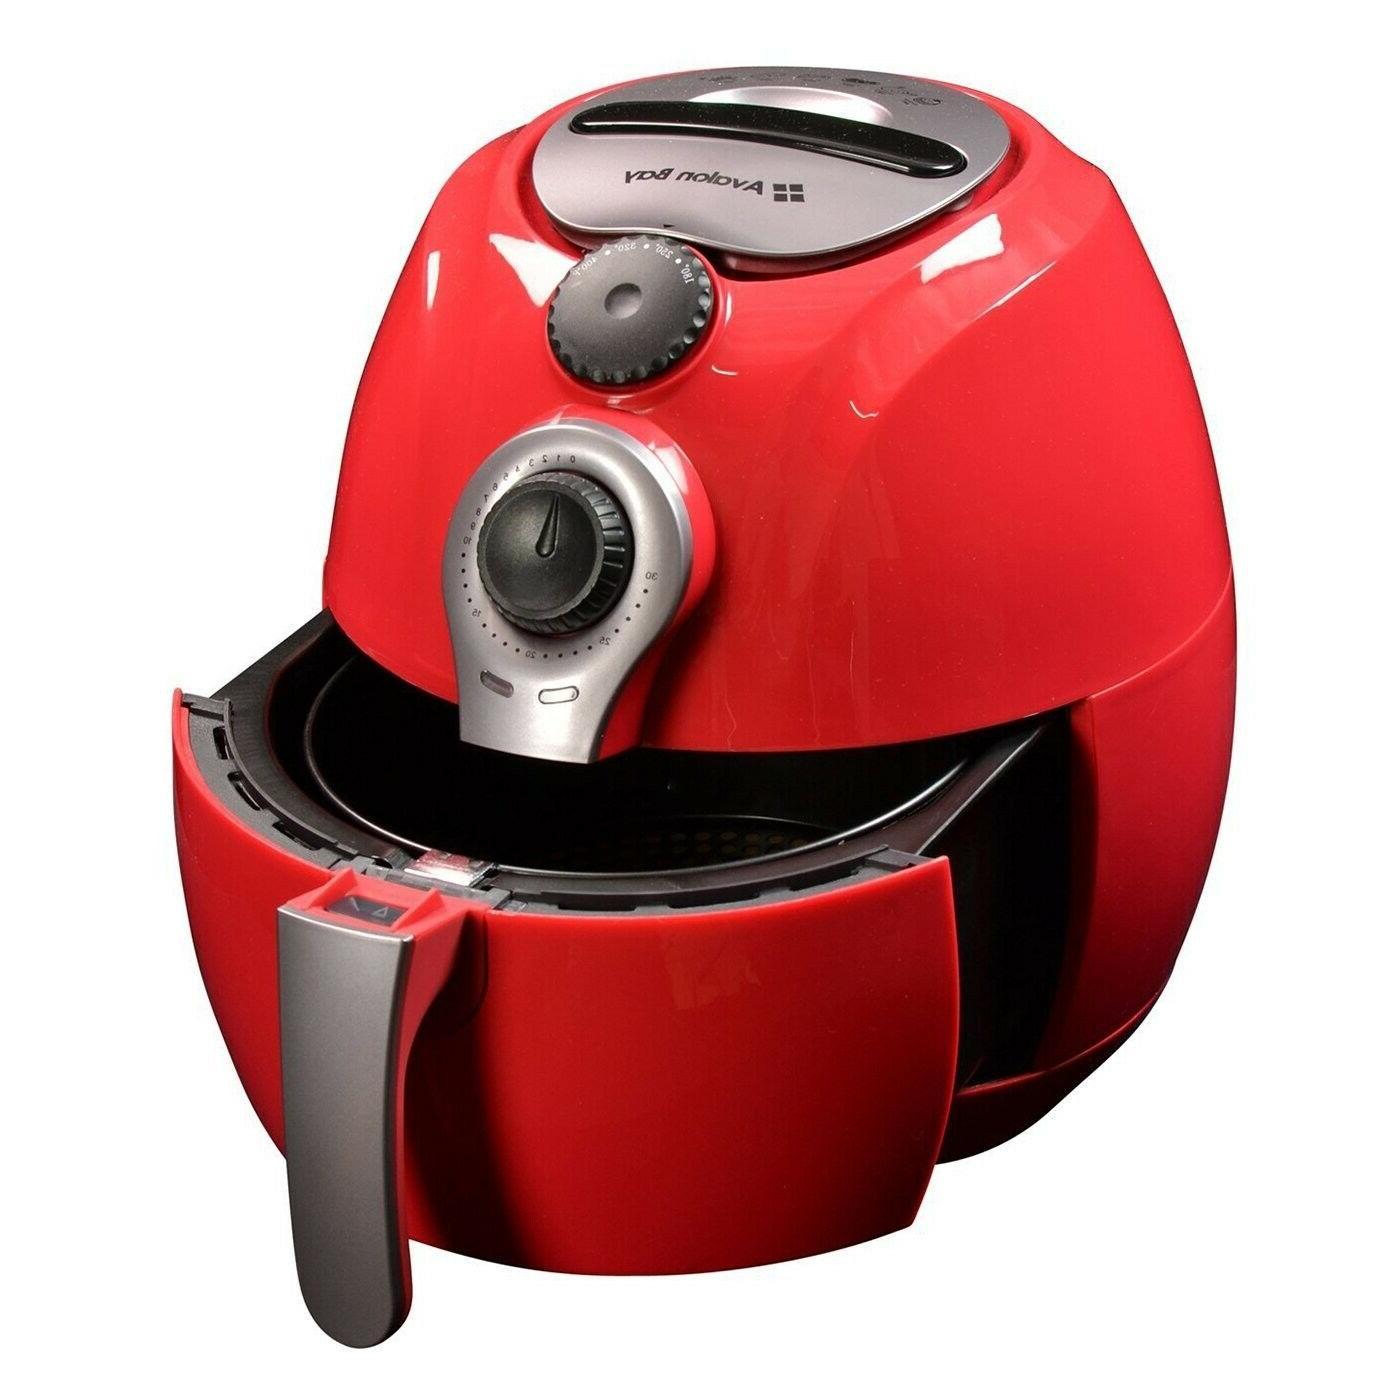 Multipurpose Air Baking Cooking No Oil